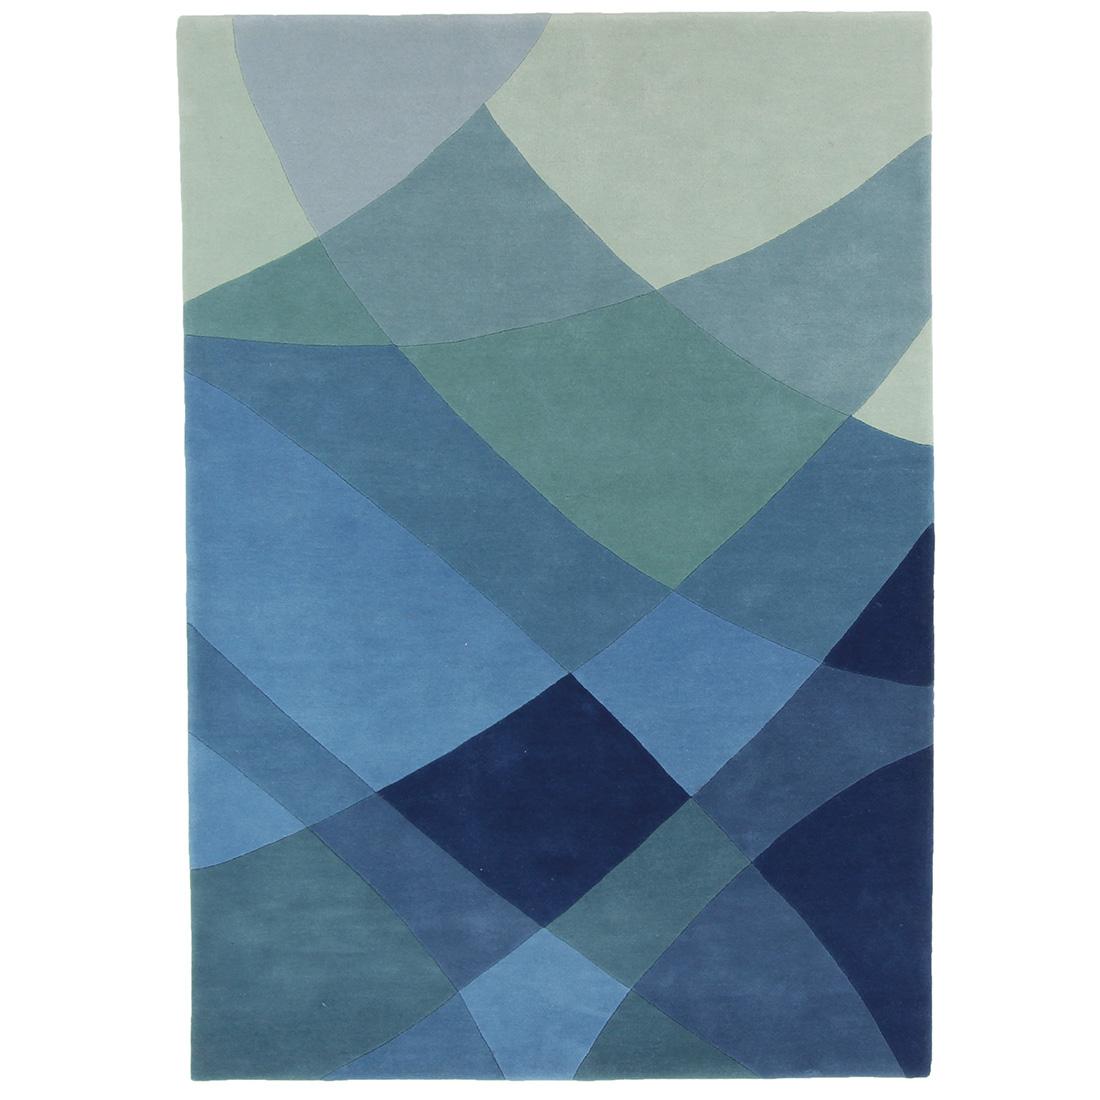 Vloerkleed Brinker Gaudion Nevio | 170 x 230 cm